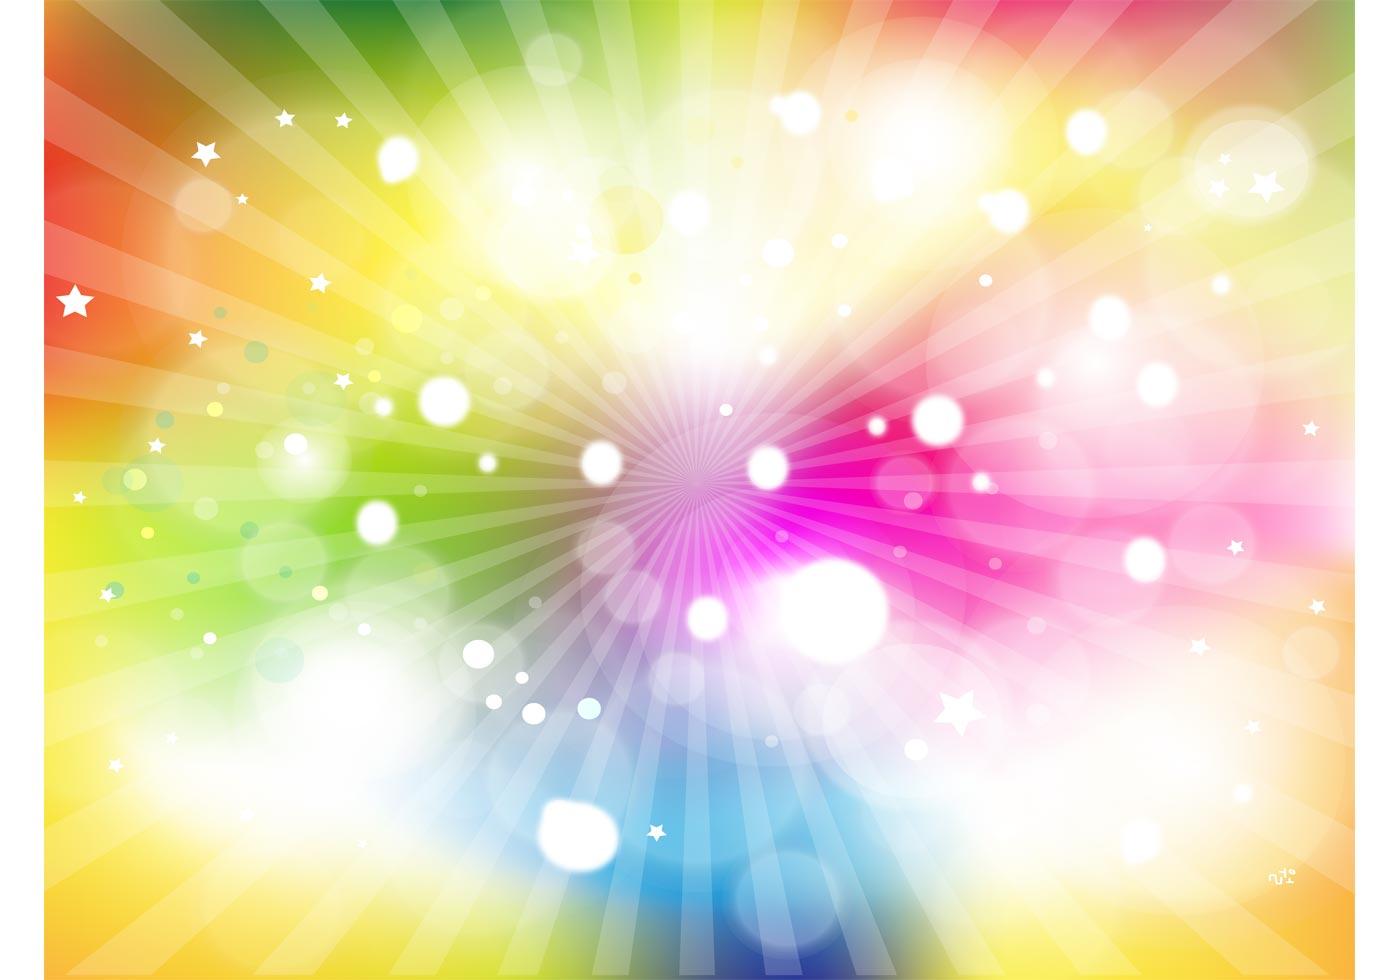 Rainbow Light Burst - Download Free Vector Art, Stock ...